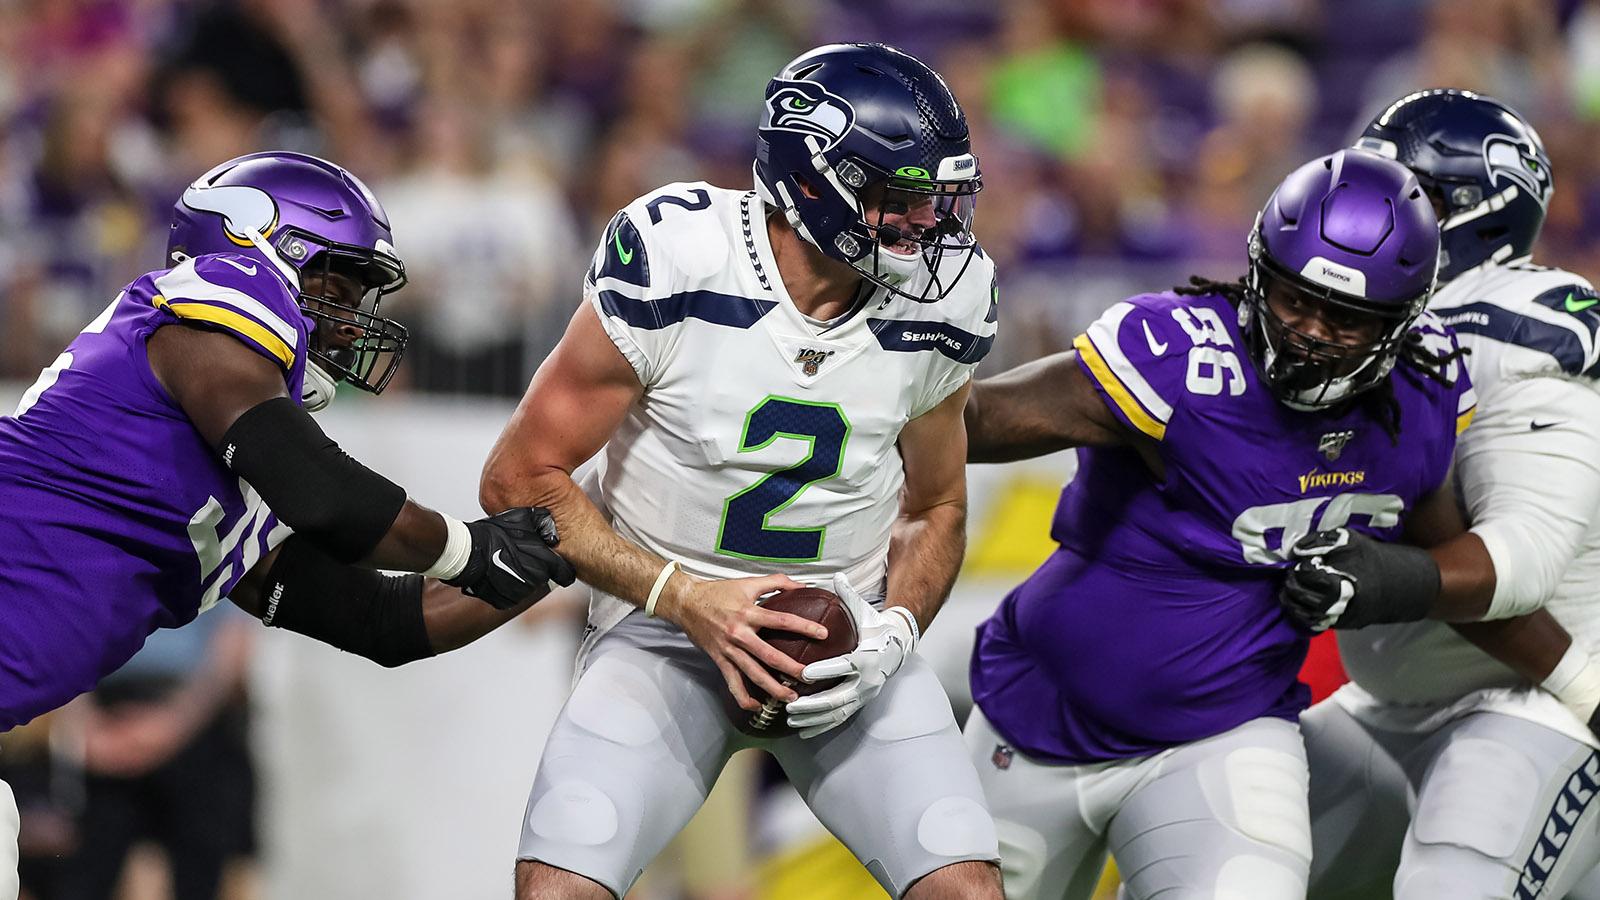 Aug 18, 2019; Minneapolis, MN, USA; Minnesota Vikings defensive lineman Ifeadi Odenigbo (95) and Armon Watts (96) sack Seattle Seahawks quarterback Paxton Lynch (2) during the second quarter at U.S. Bank Stadium. Mandatory Credit: Brace Hemmelgarn-USA TODAY Sports